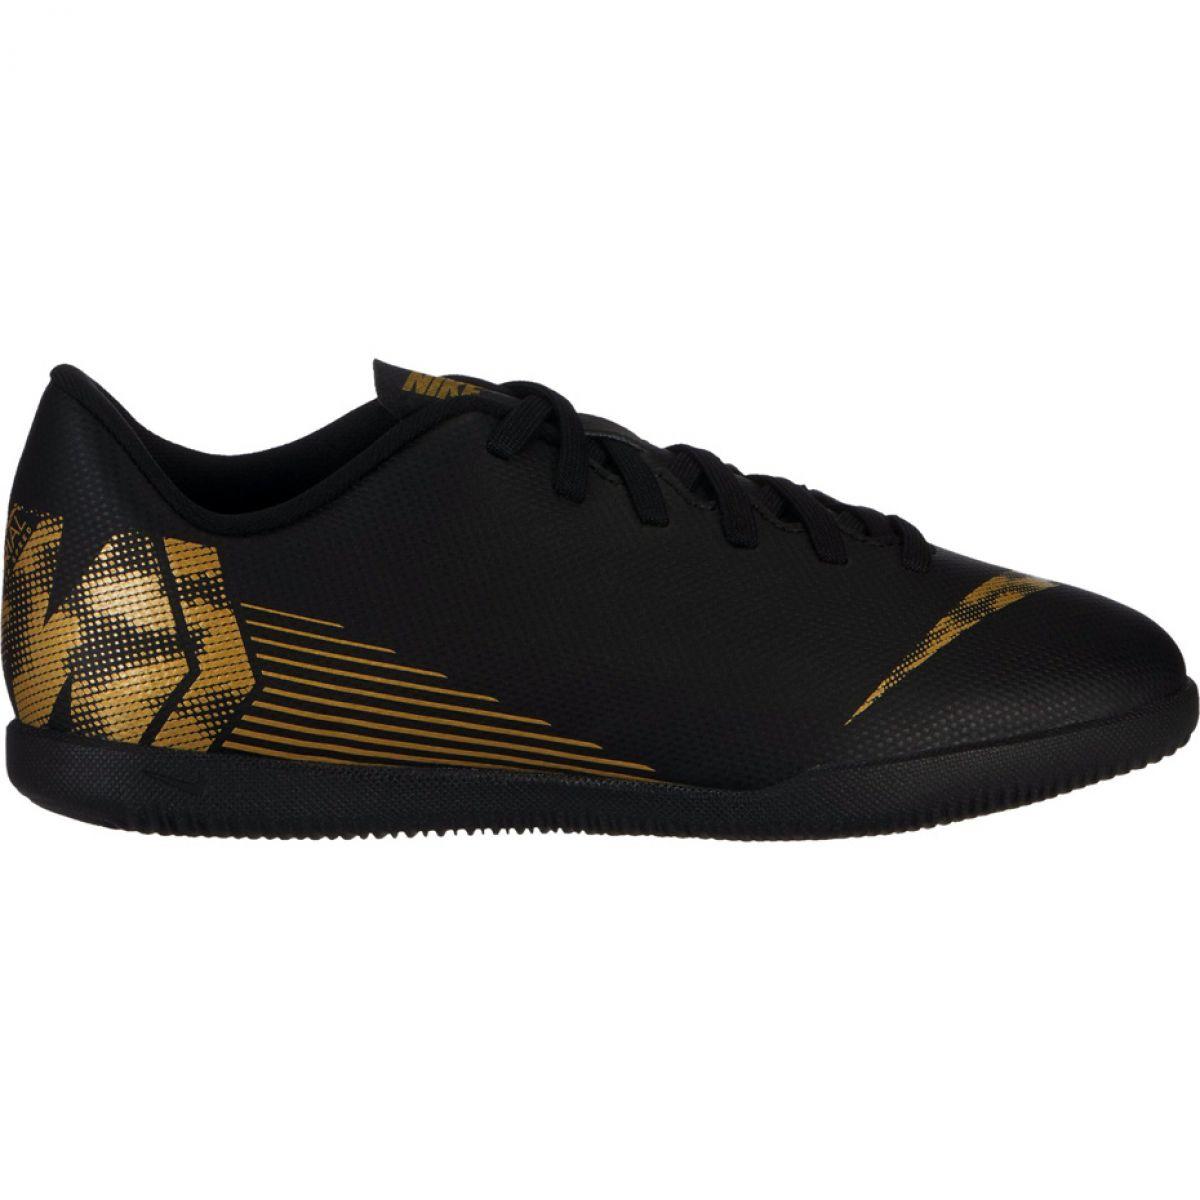 free shipping 9c24a 6024a Indoor shoes Nike Mercurial Vapor X 12 Club Ic Jr AH7354-077